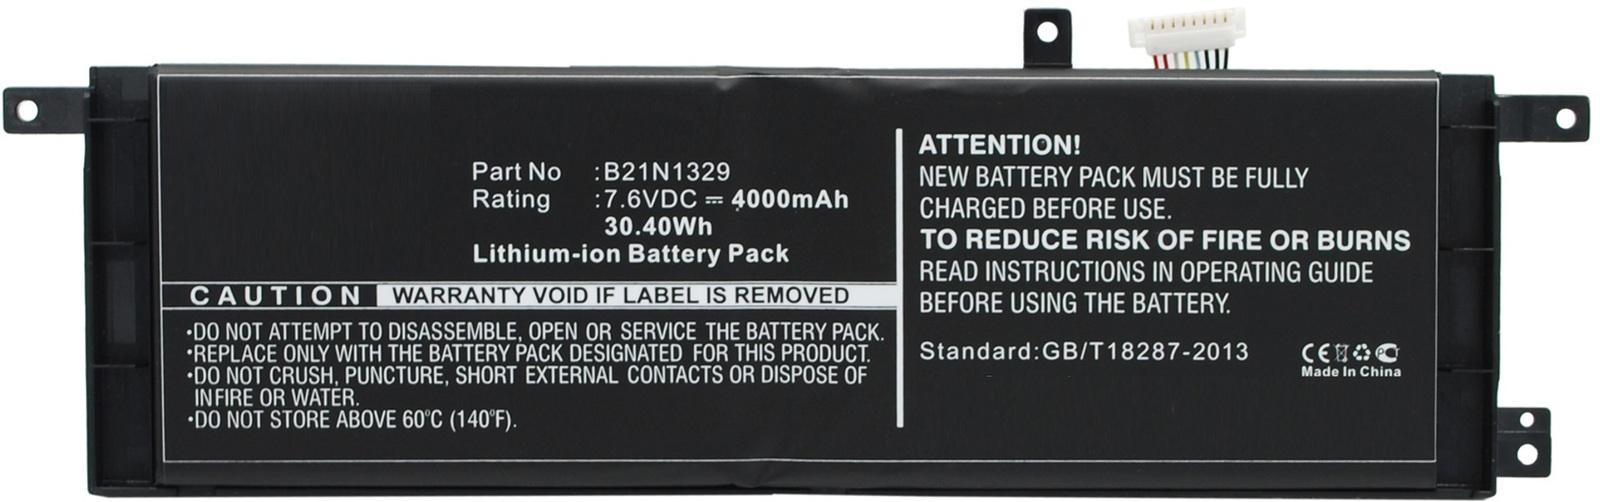 MicroBattery Laptop Battery for Asus 30.4Wh Li-ion 7.6V 4000mAh MBXAS-BA0134 - eet01